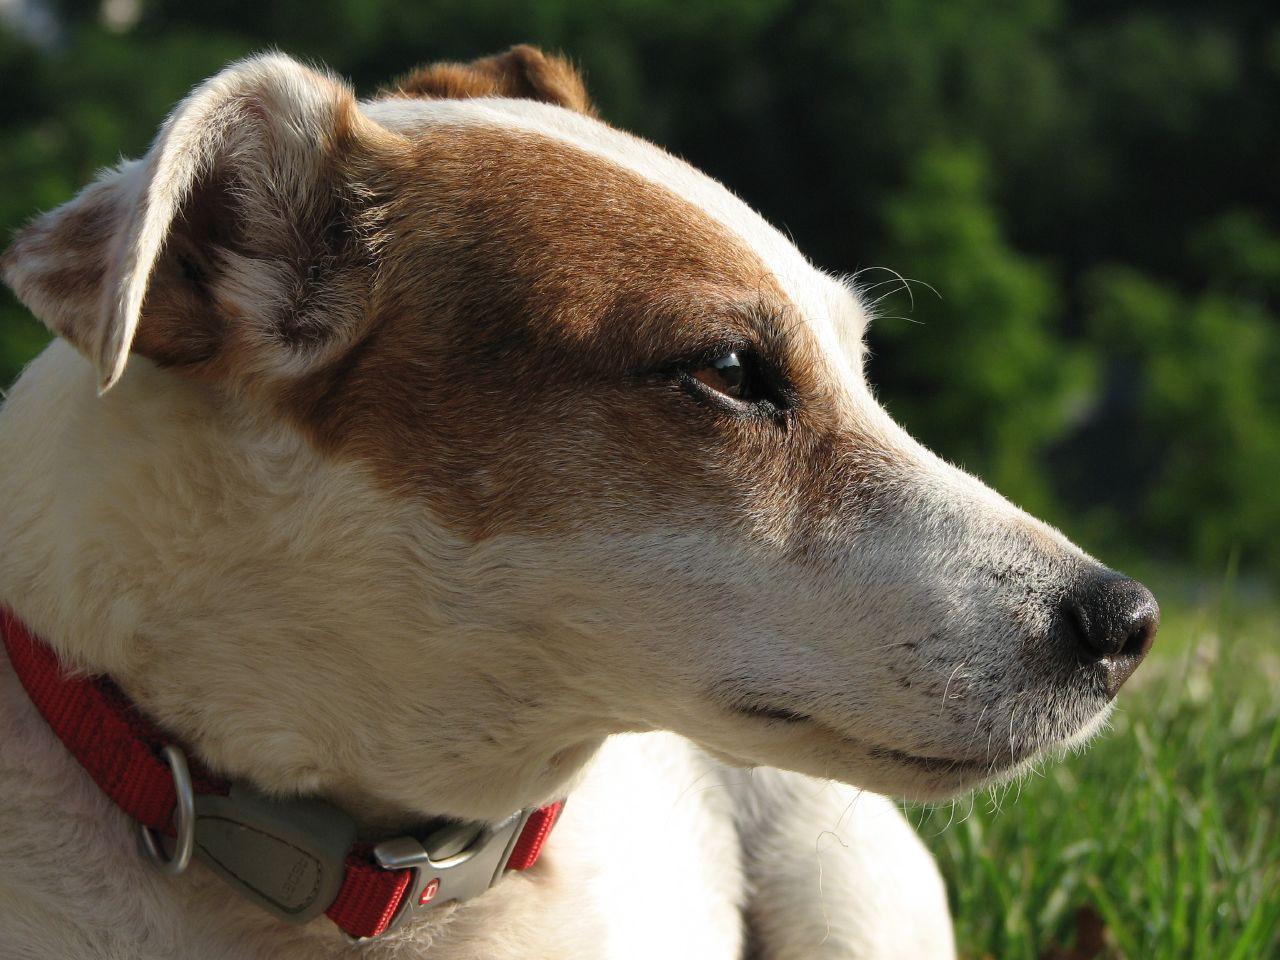 File:Jack Russell Terrier portrait.jpg